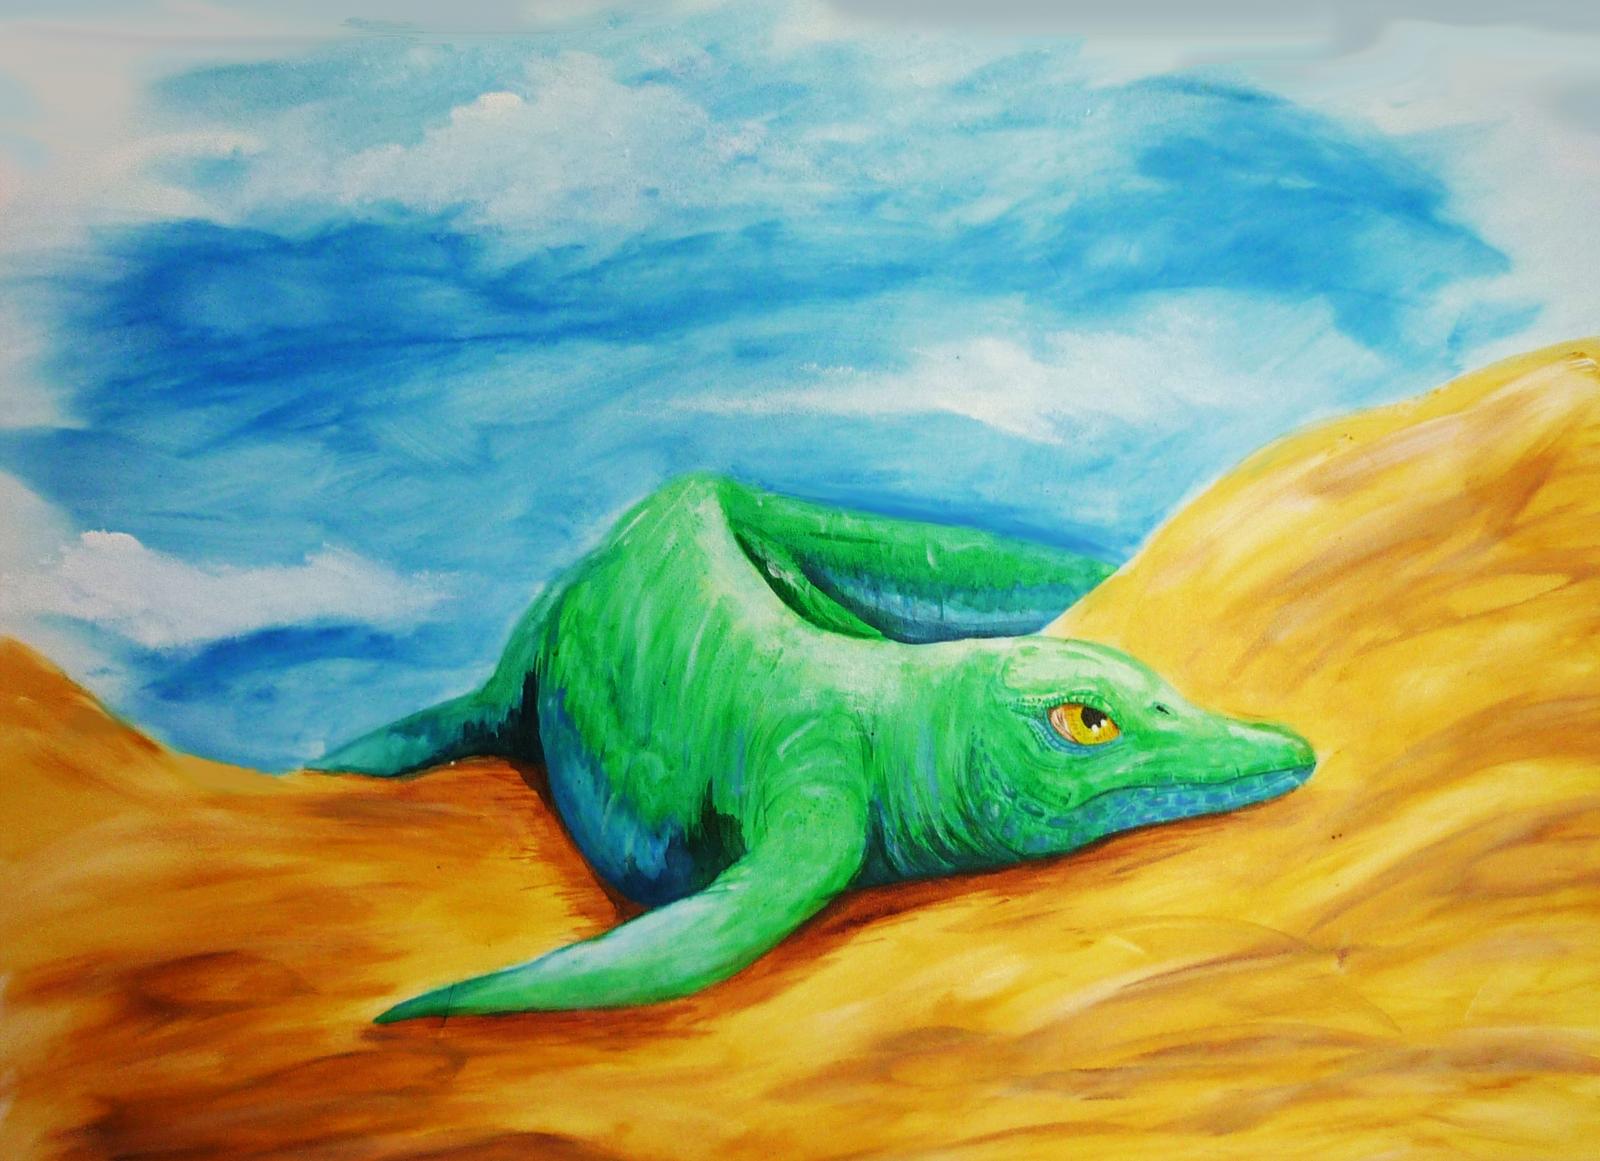 Amphibious Ichthyosaur